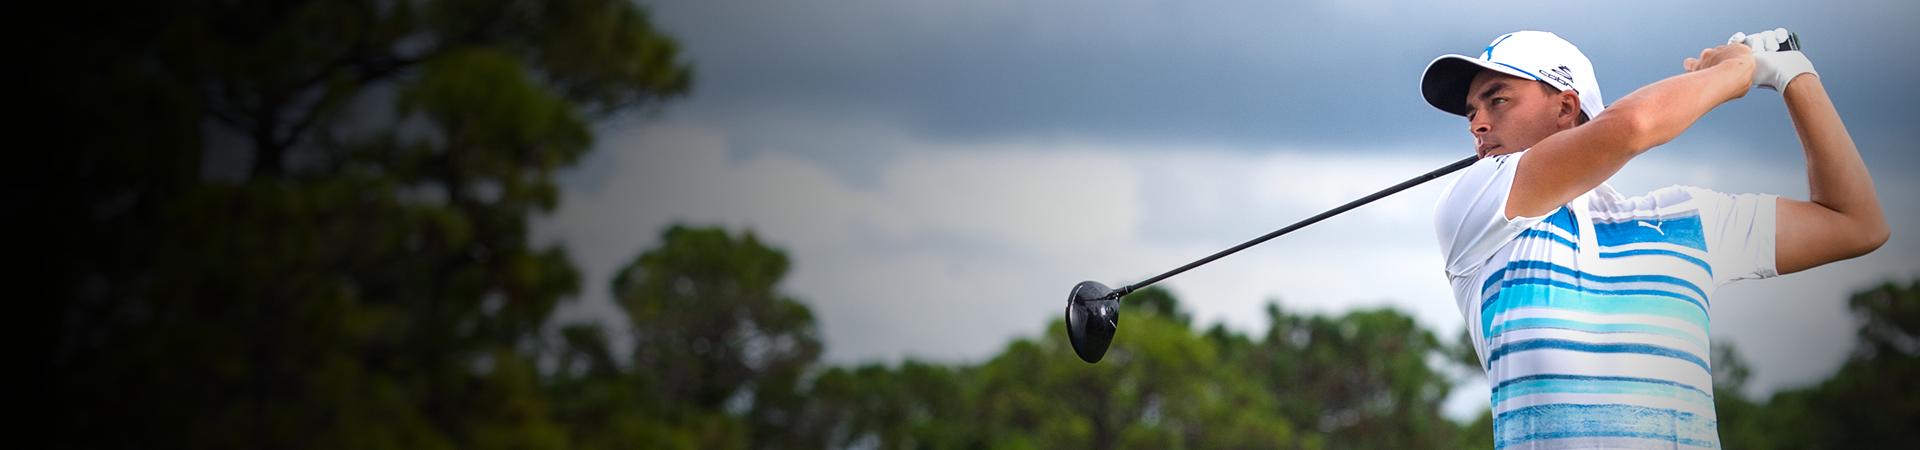 Puma Golf - Rickie Fowler Hero Image